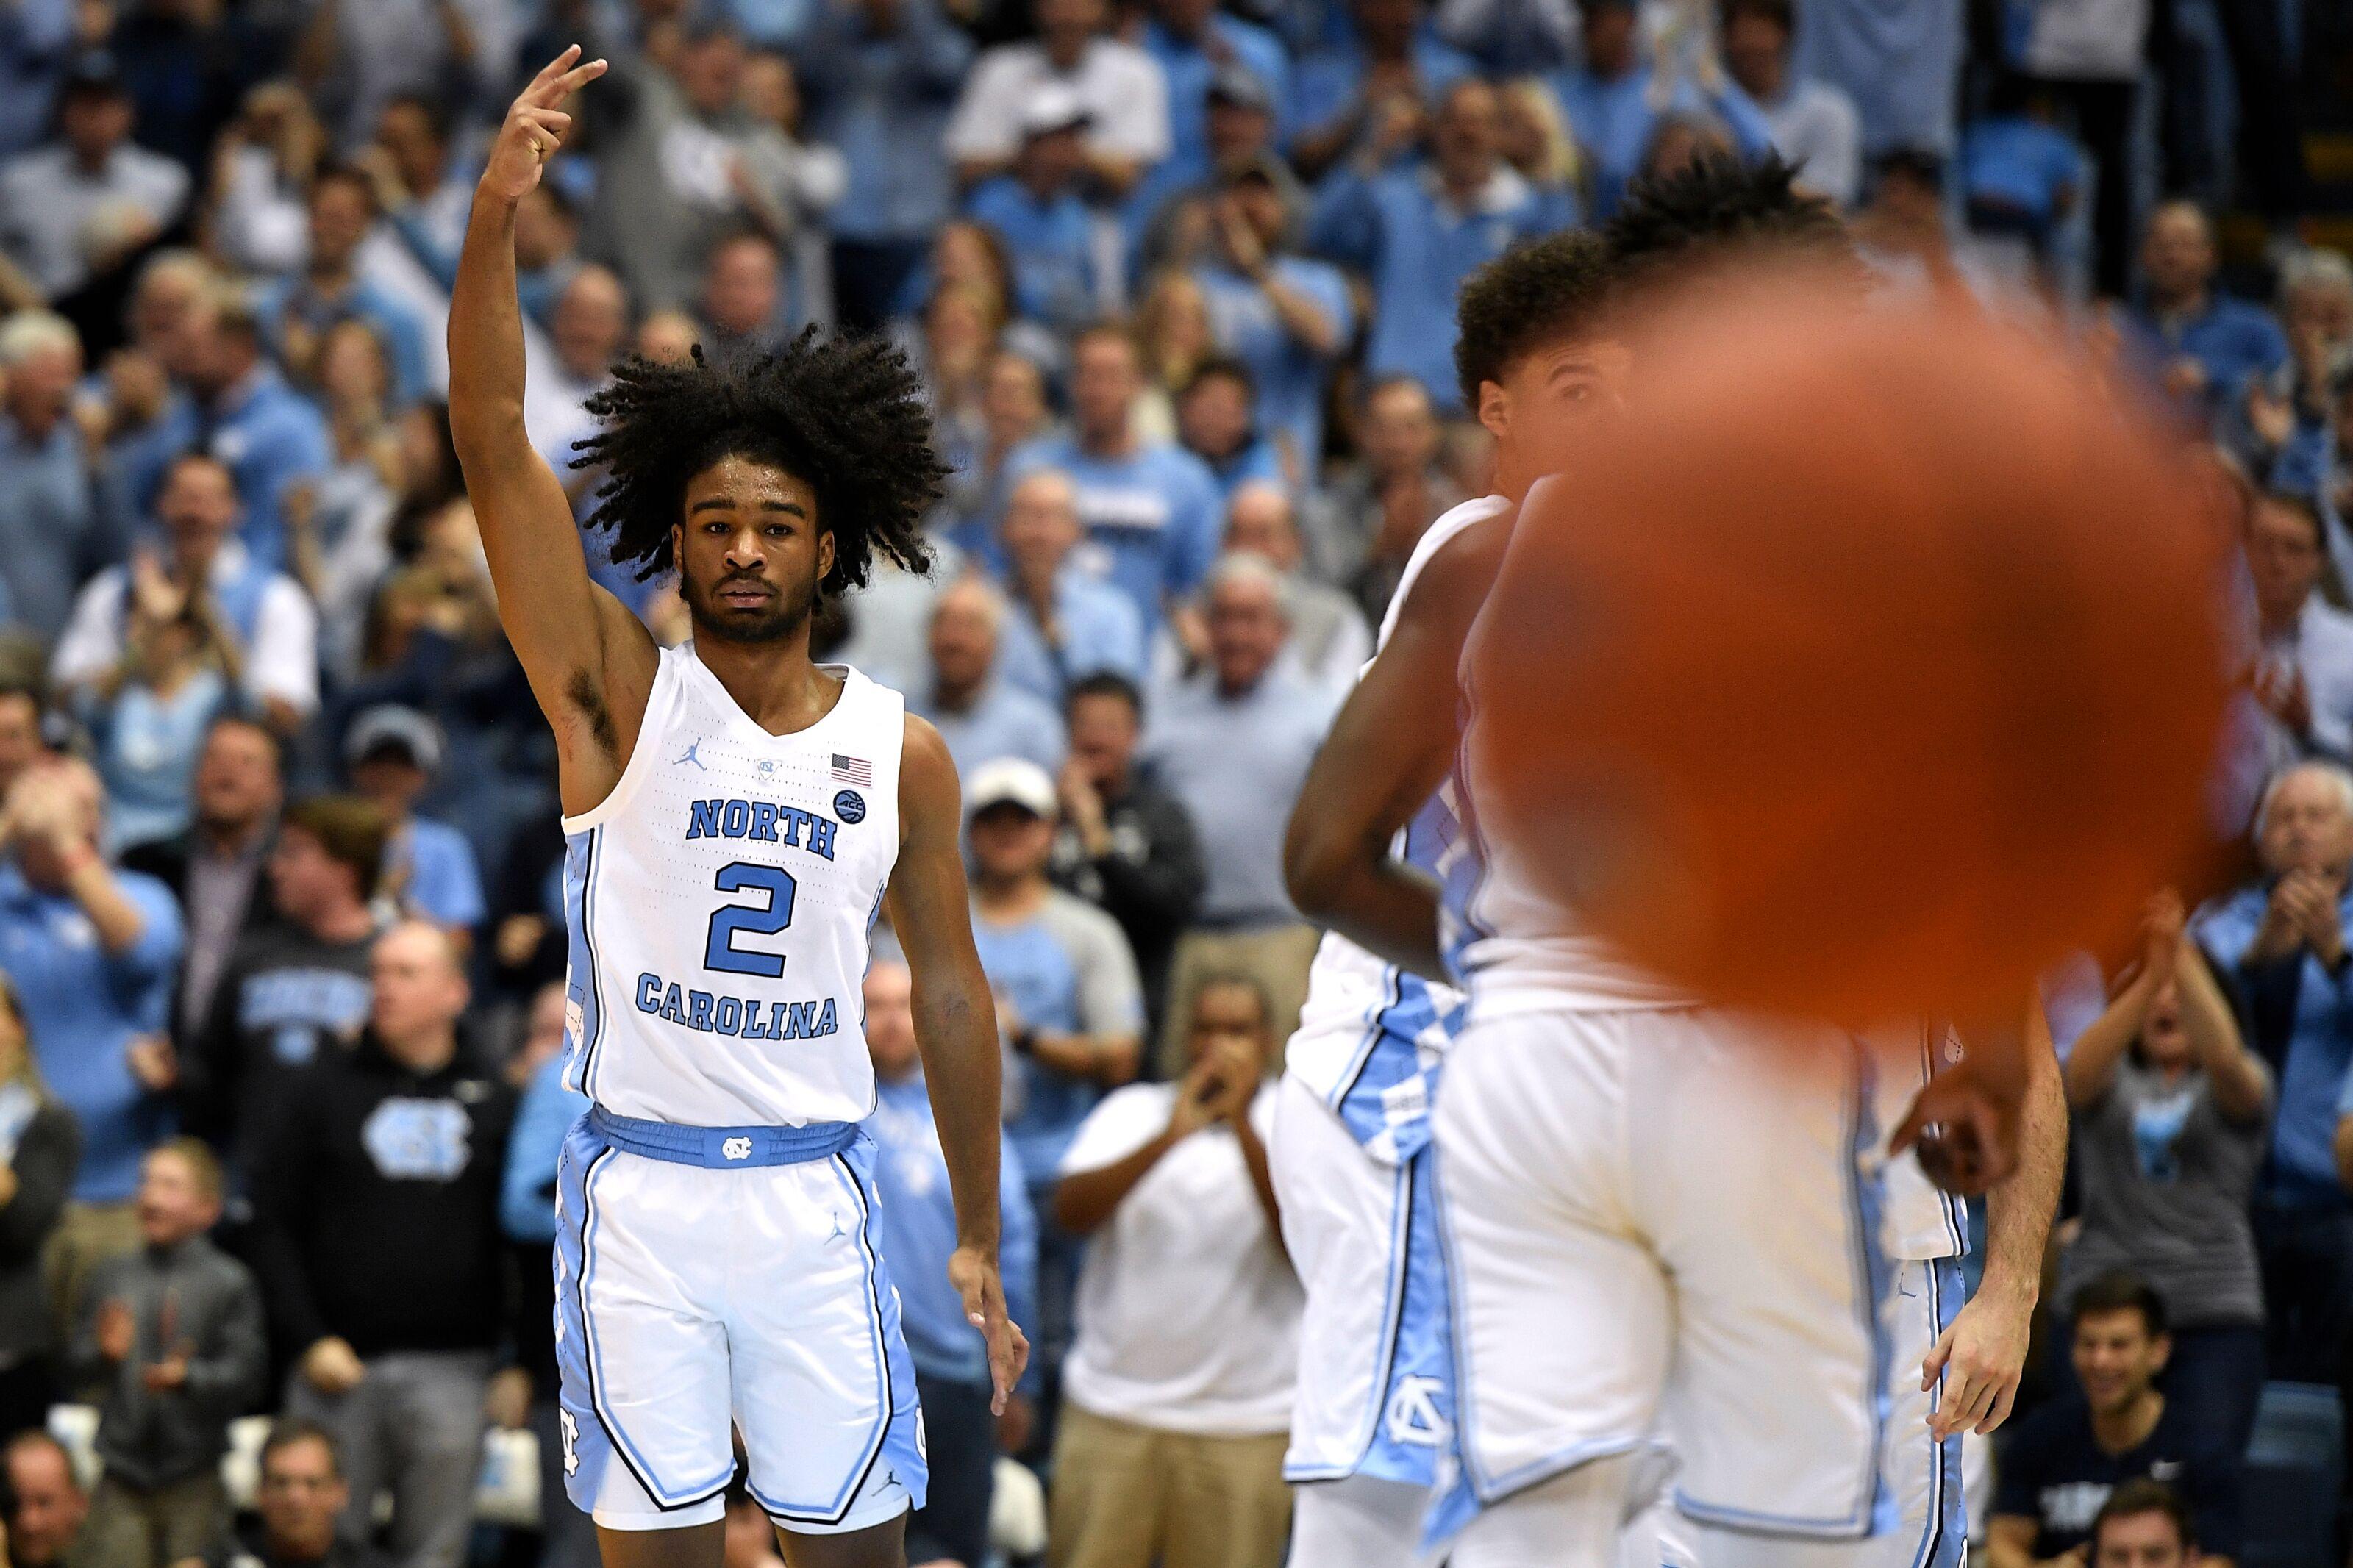 UNC Basketball: Tar Heels sweep ACC Weekly honors